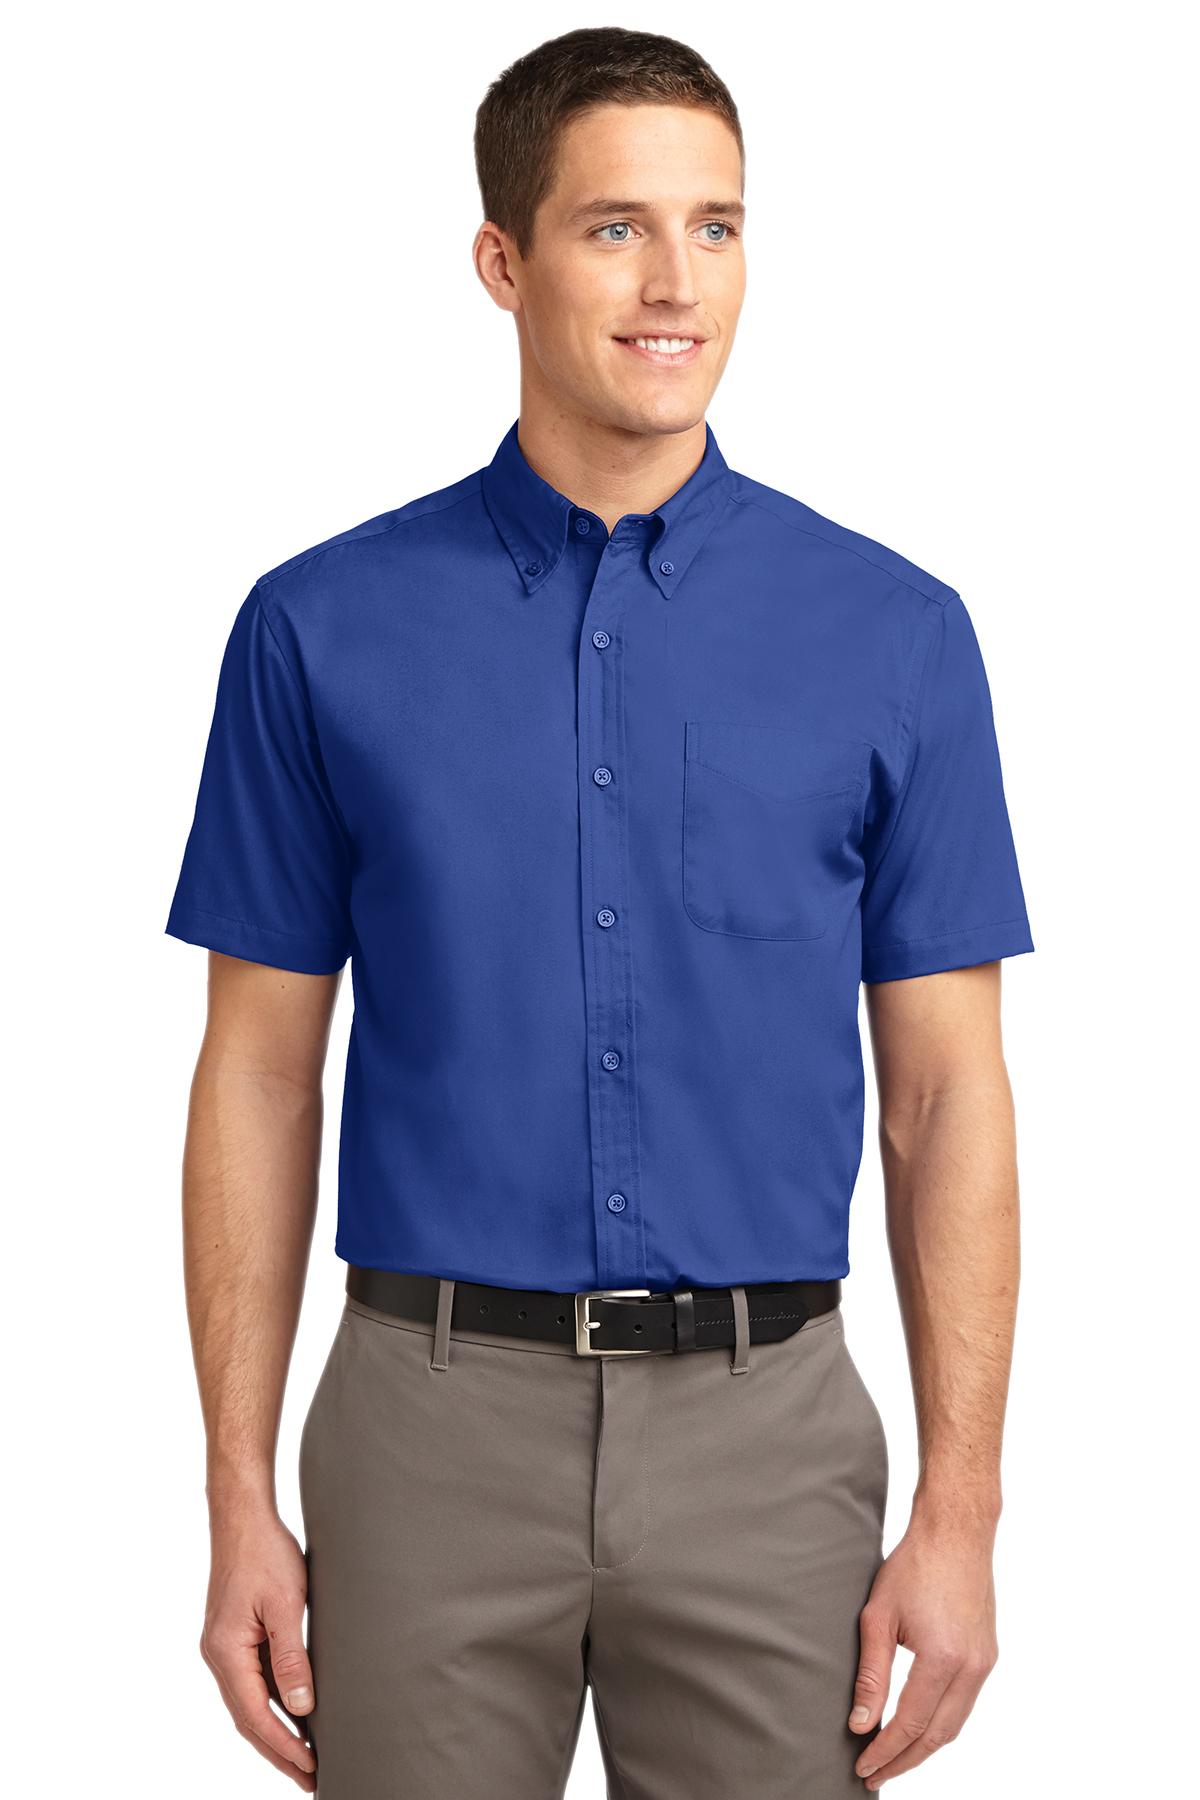 S608 Royal//Classic Navy Port Authority Long Sleeve Easy Care Shirt